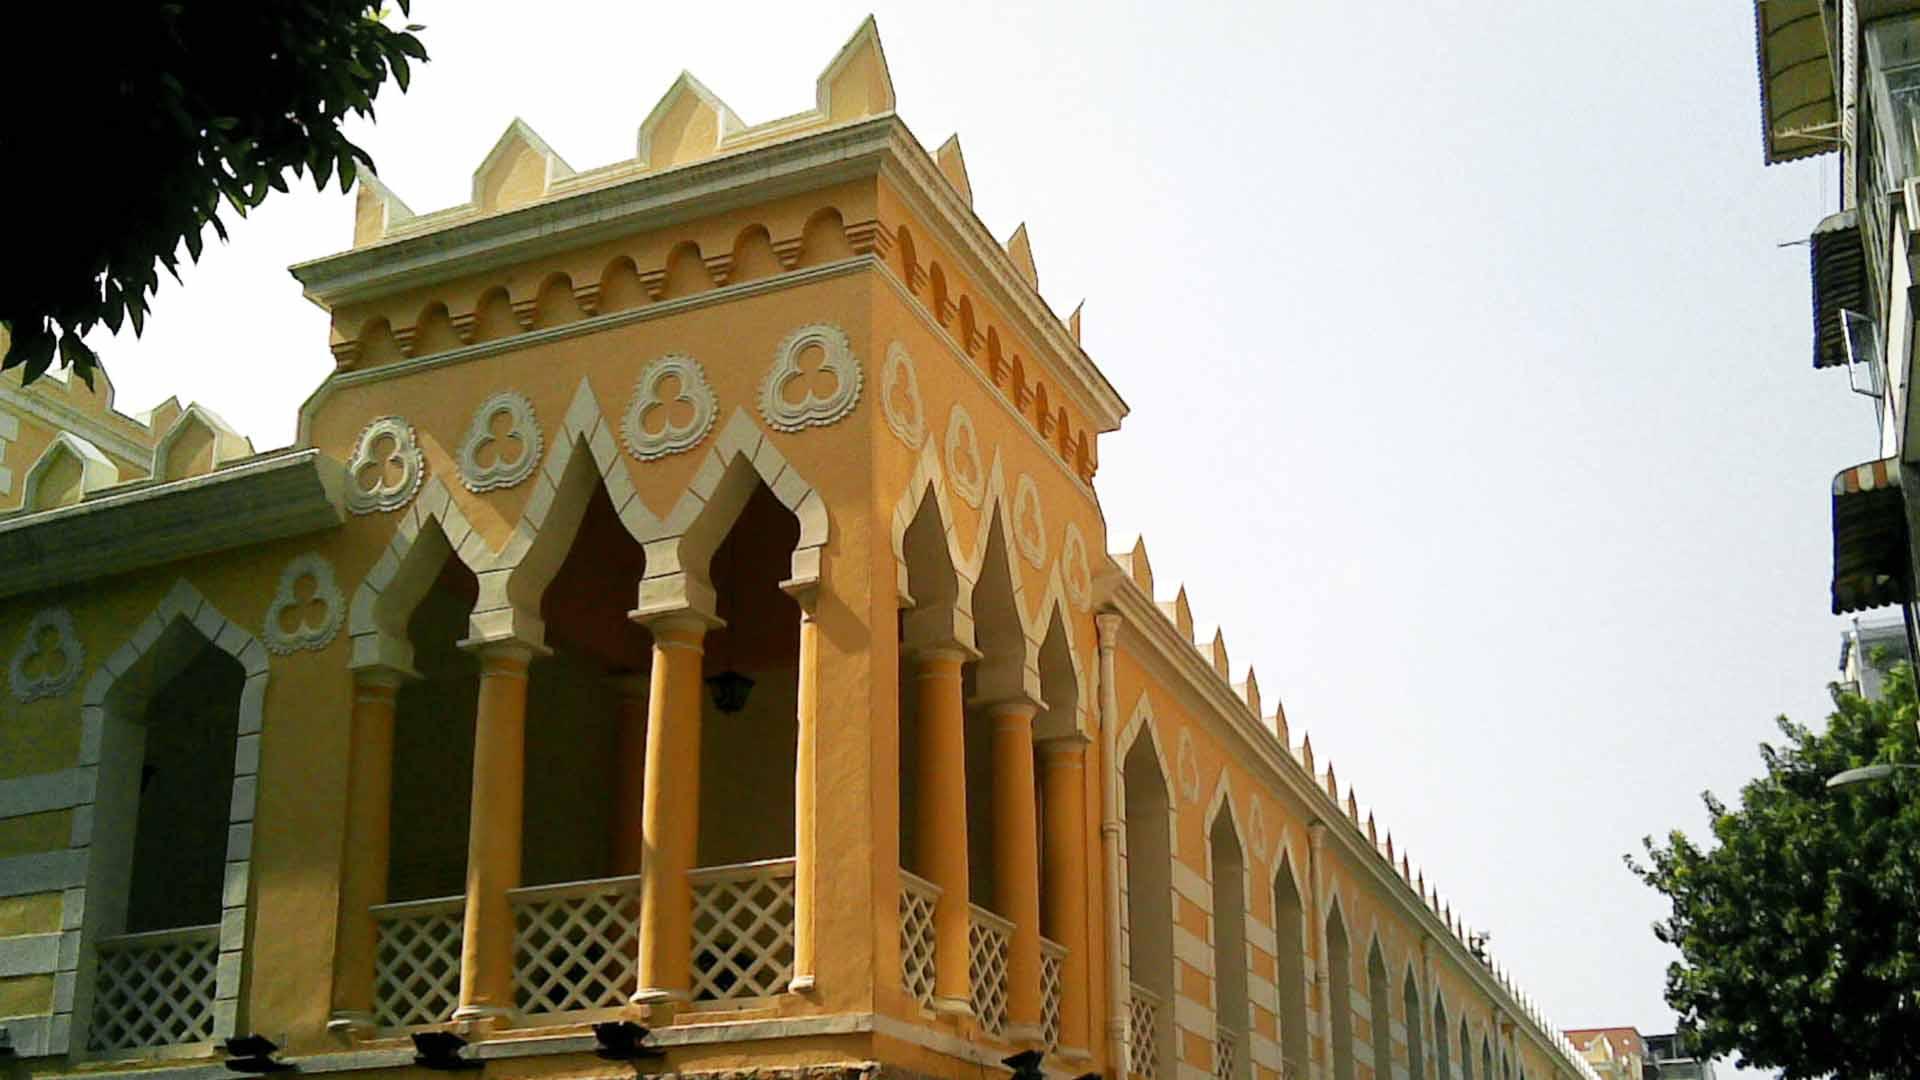 Renovation of the Moorish Barracks in Macau